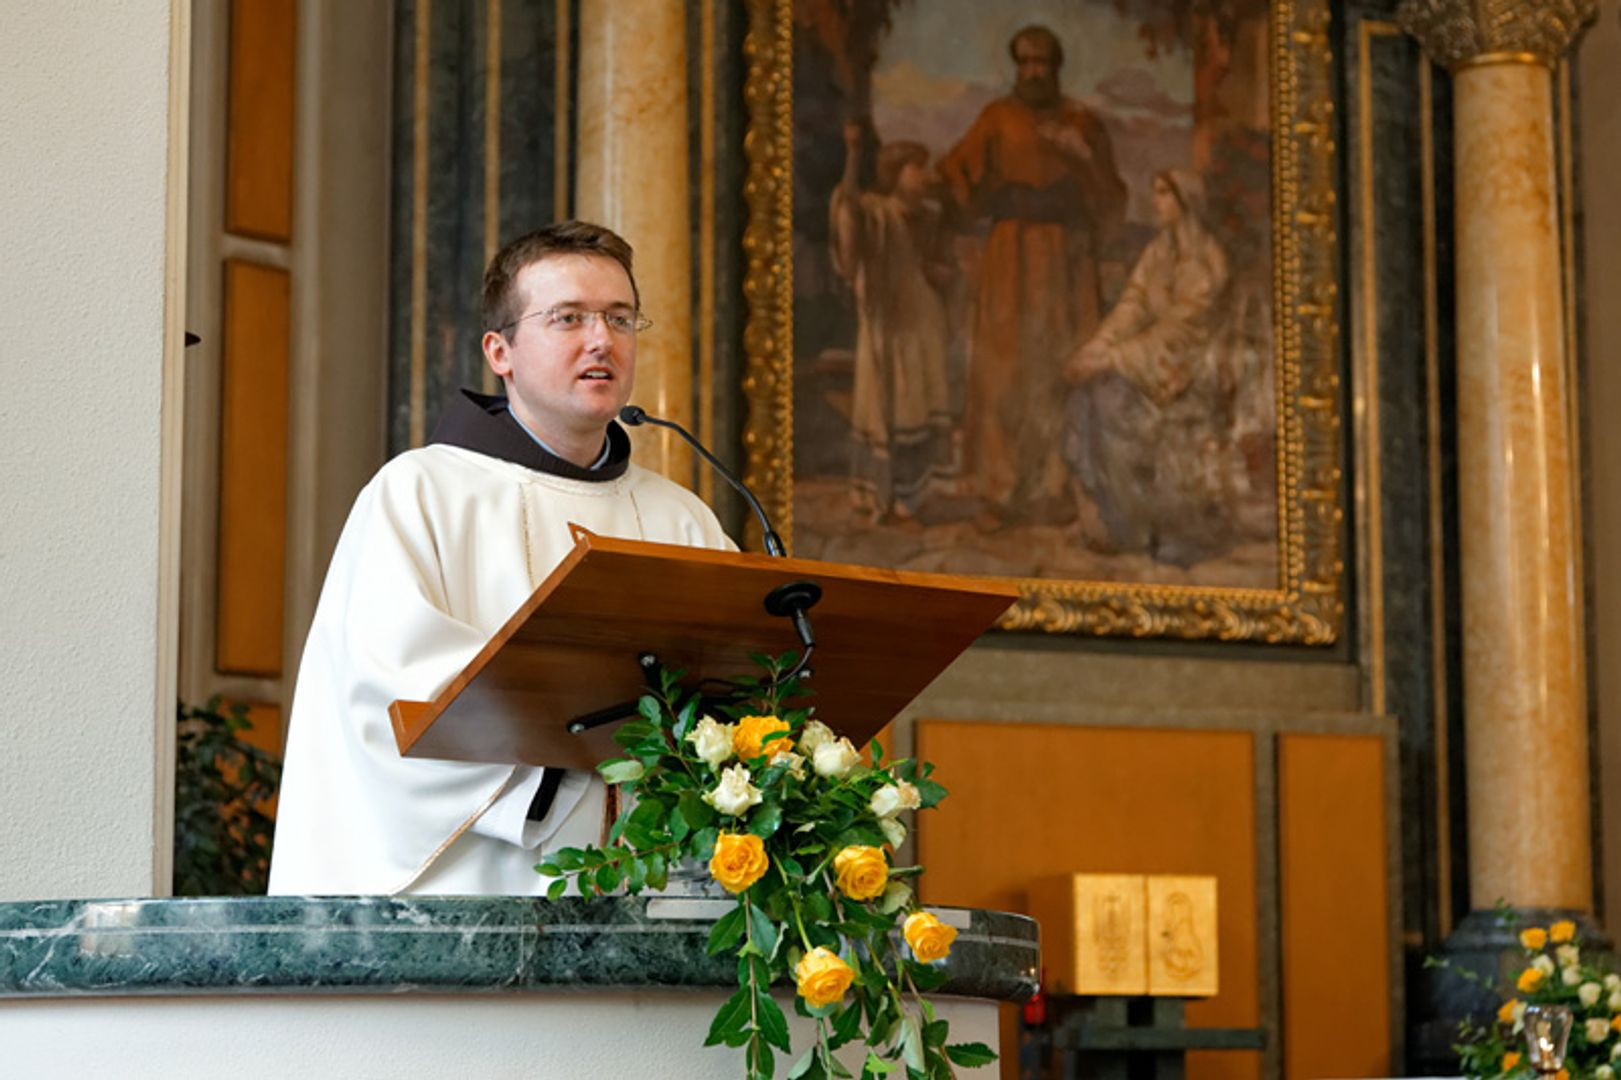 Pater Stanko Cosic